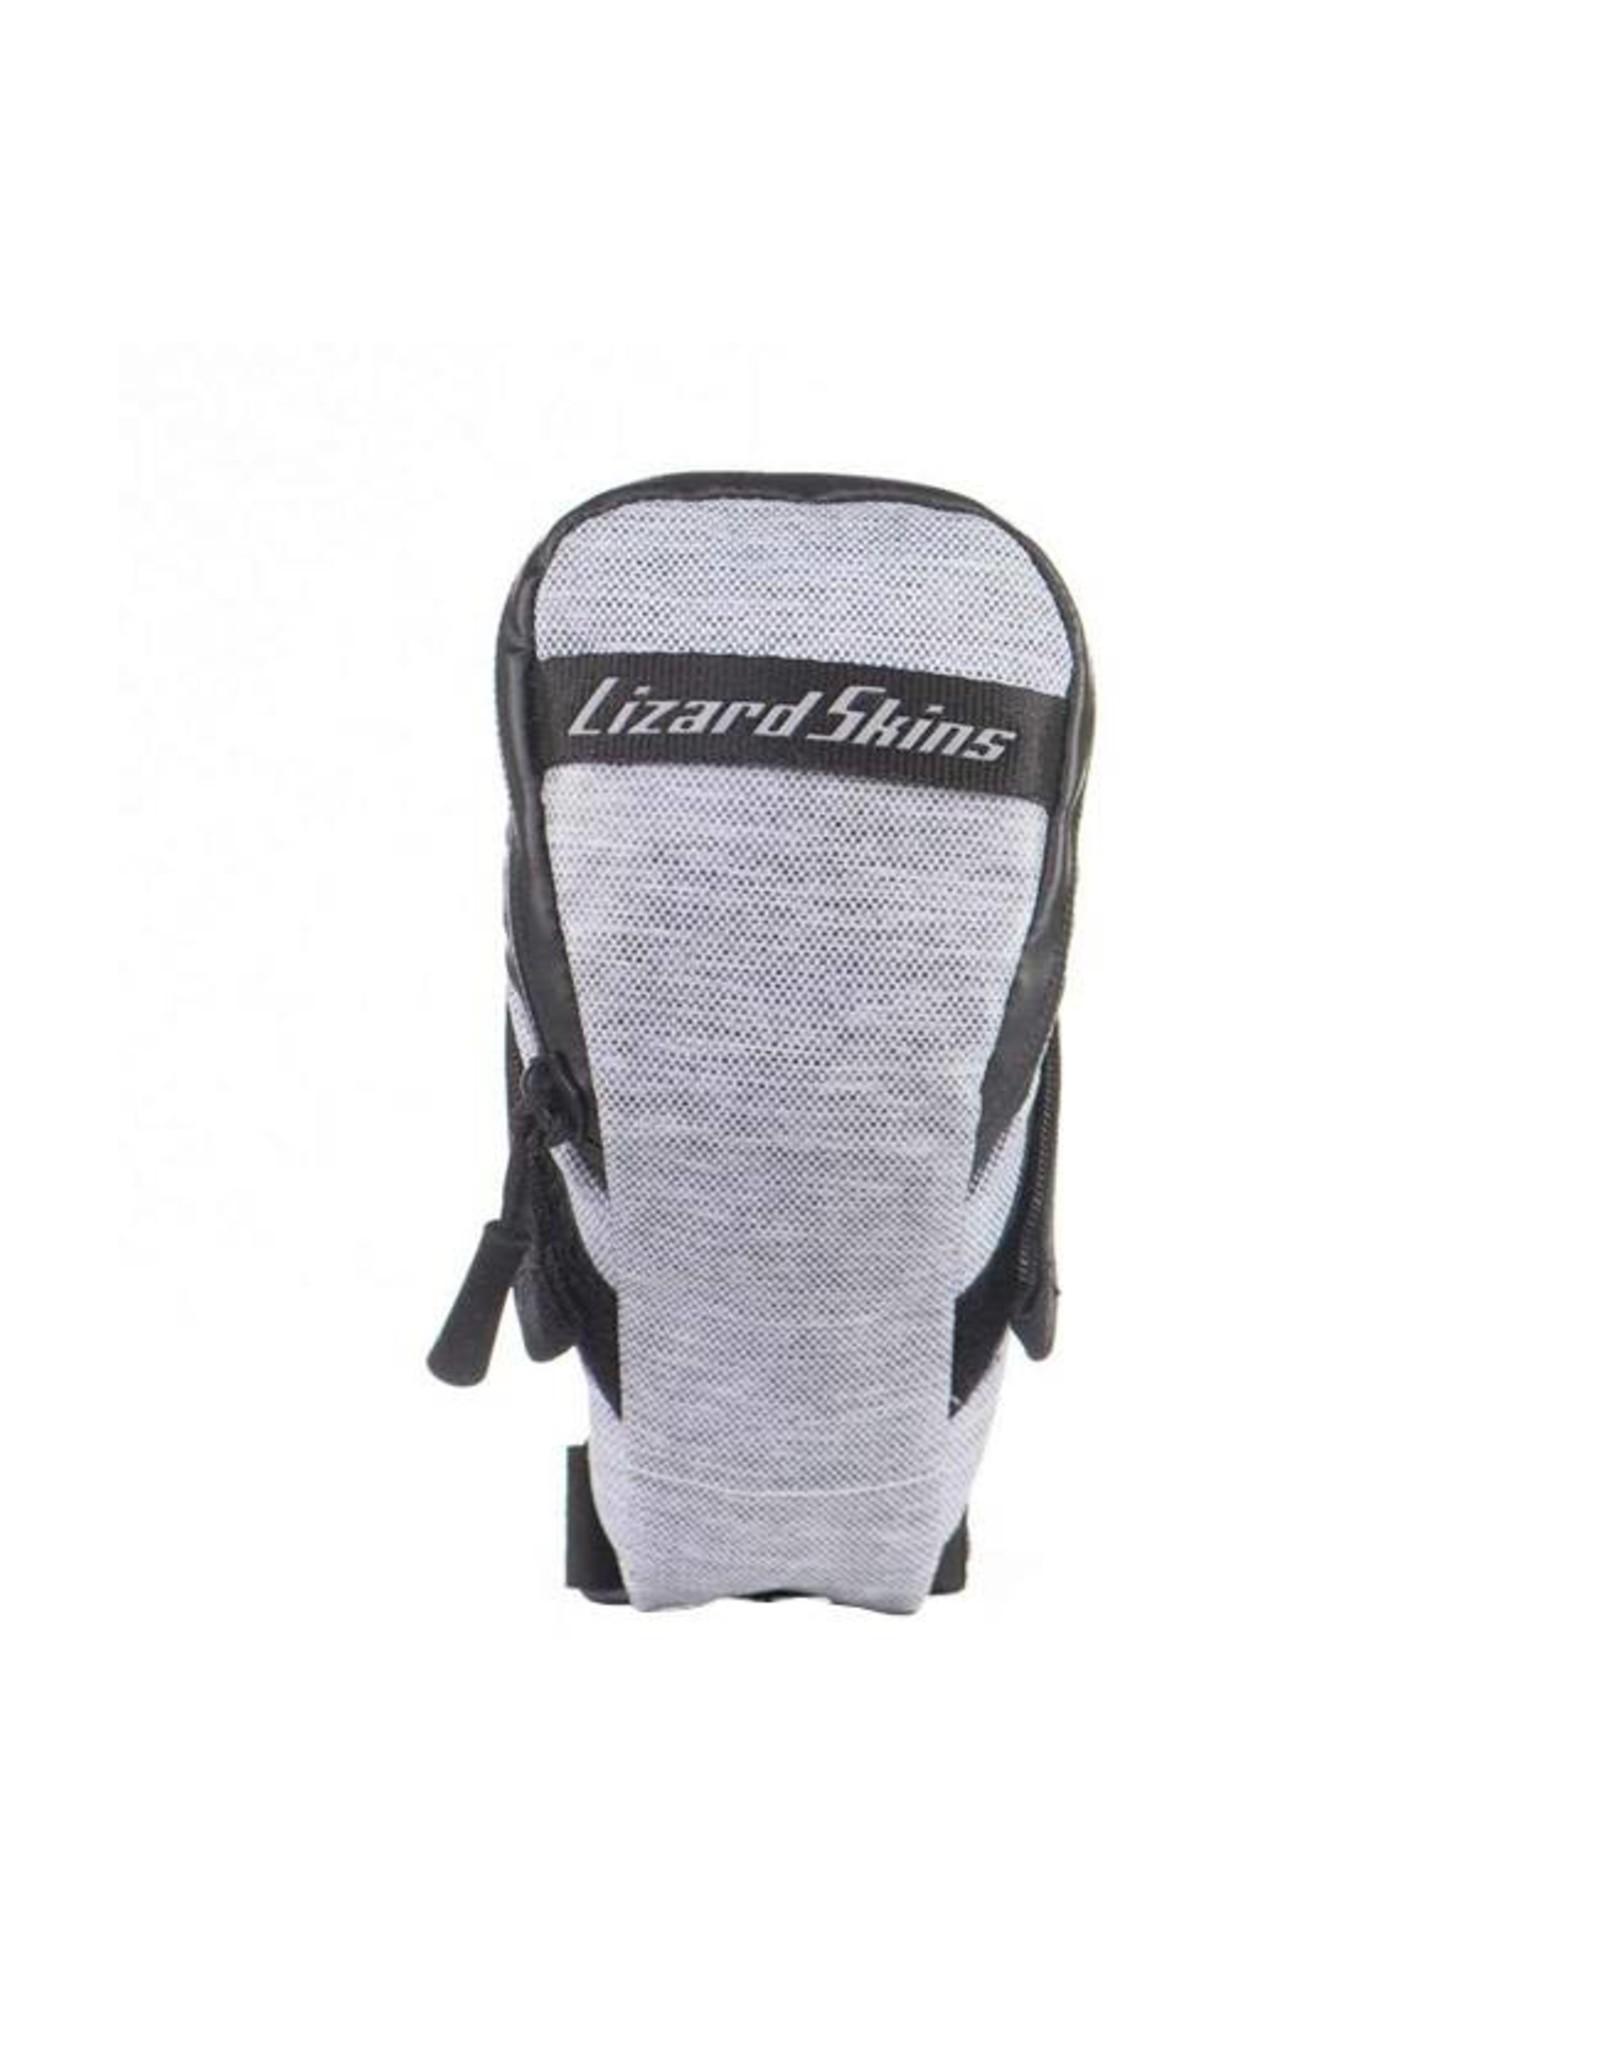 Lizard Skins Lizard Skins Micro Cache Seat Bag: Lead